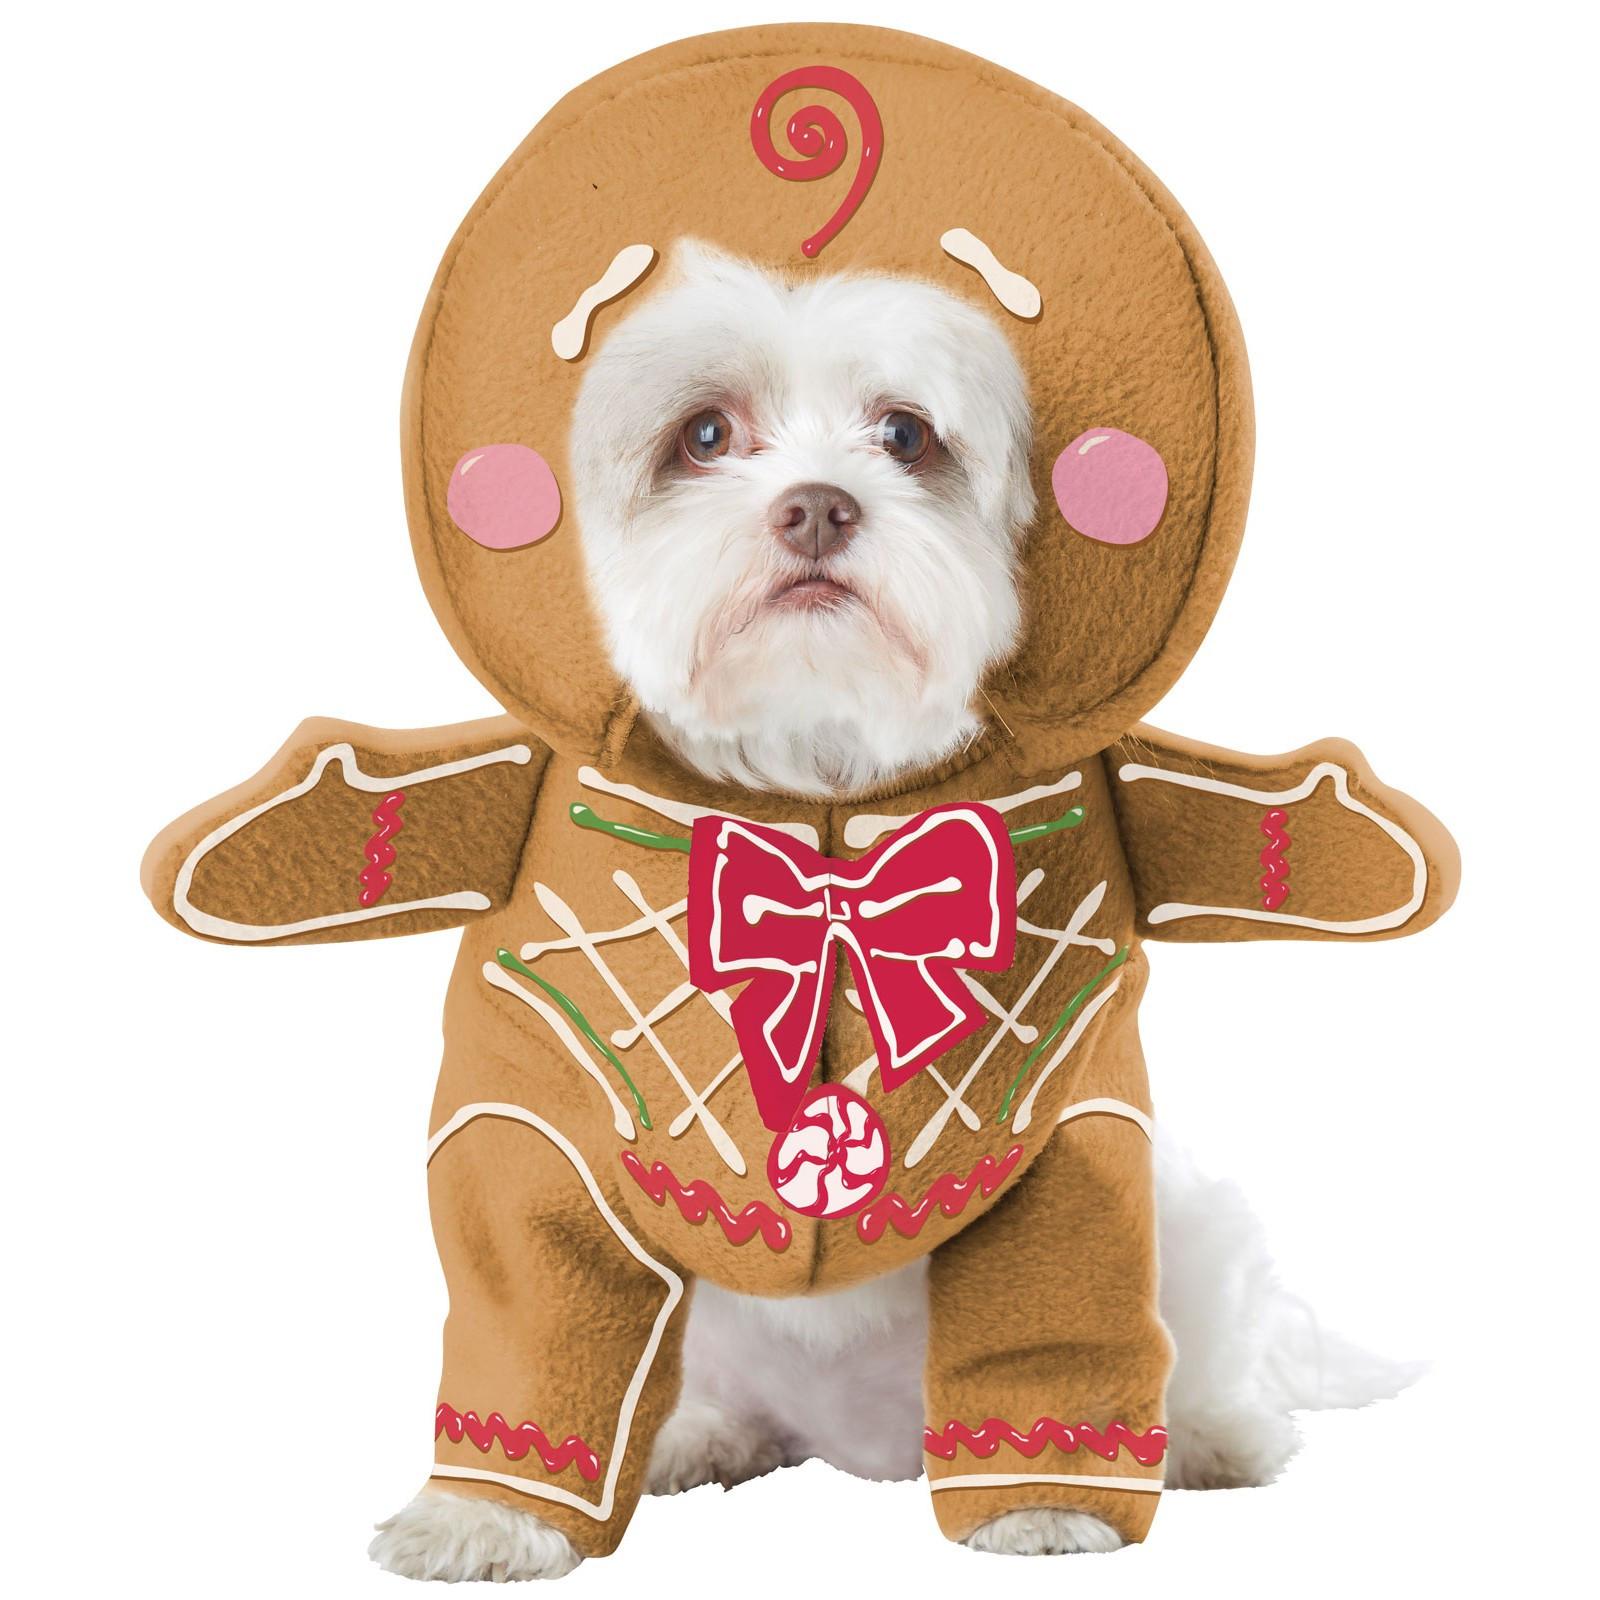 Pan De Jengibre Cachorro De Disfraces De Mascotas-019519094806-0